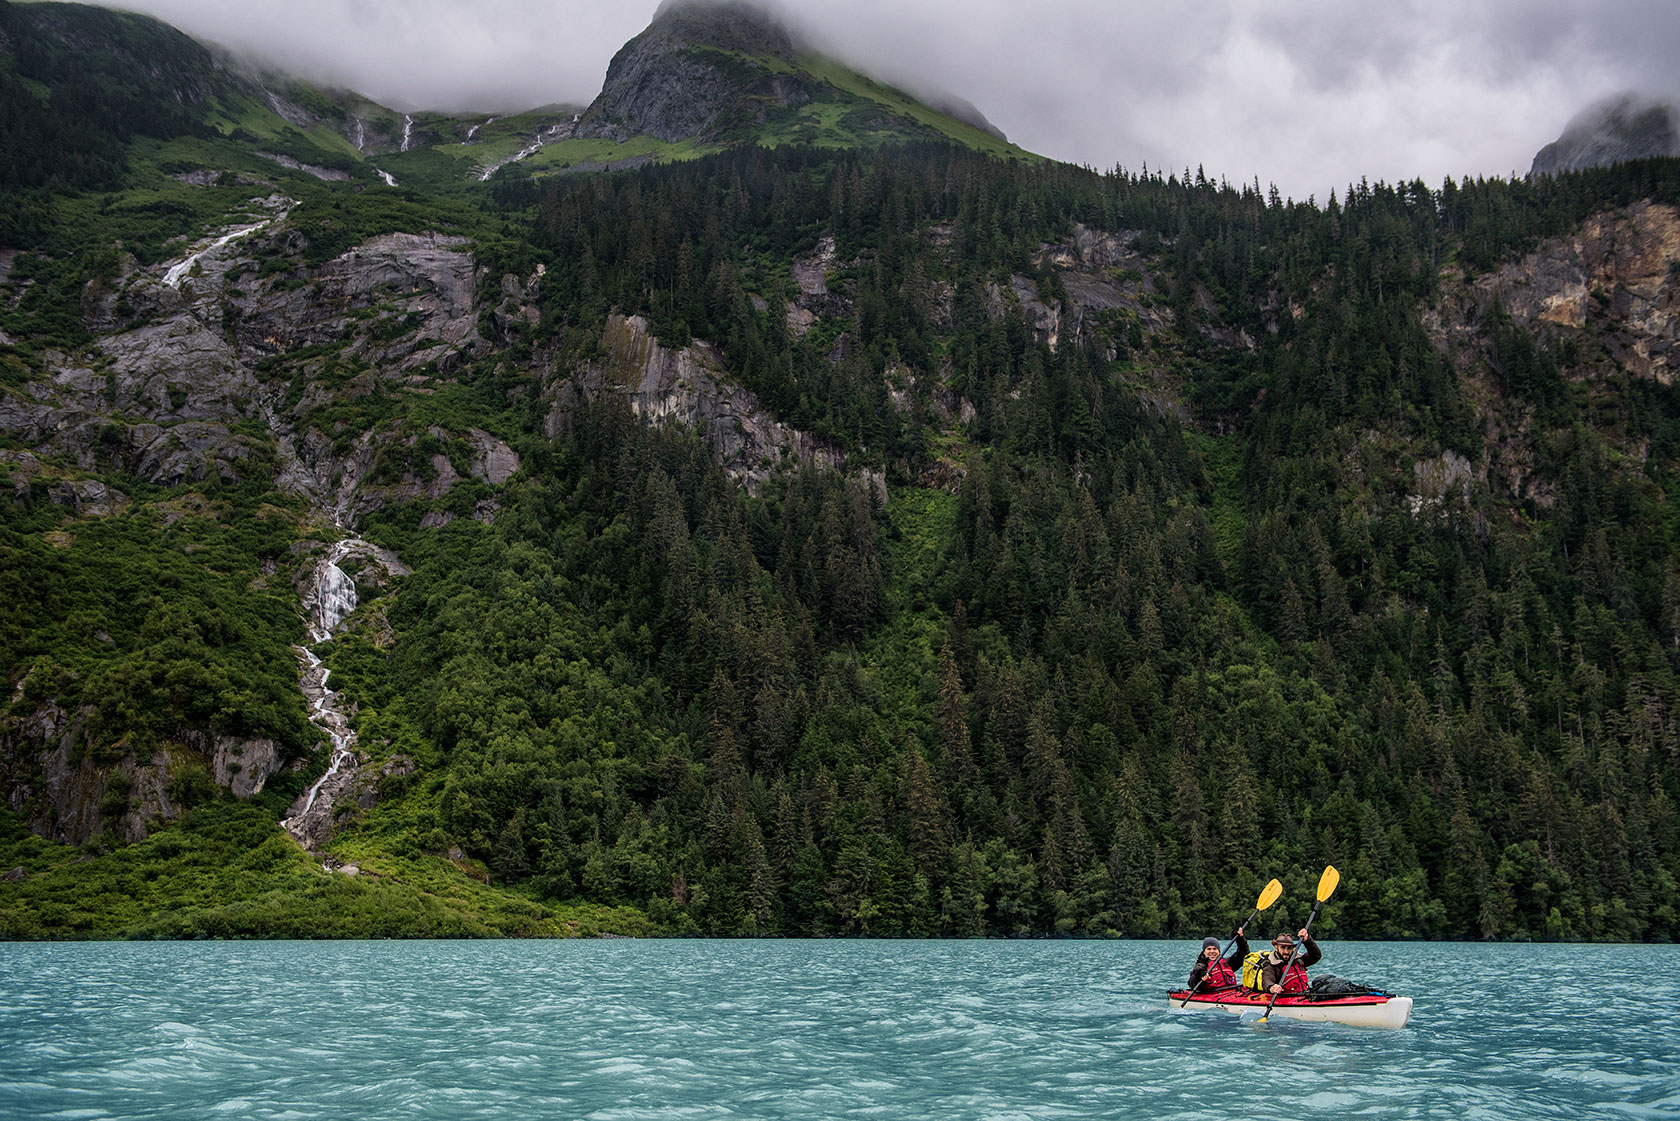 austin-trigg-brave-wilderness-alaska-BW-Mark-Coyote-kayak-Chilkoot-Lake.jpg